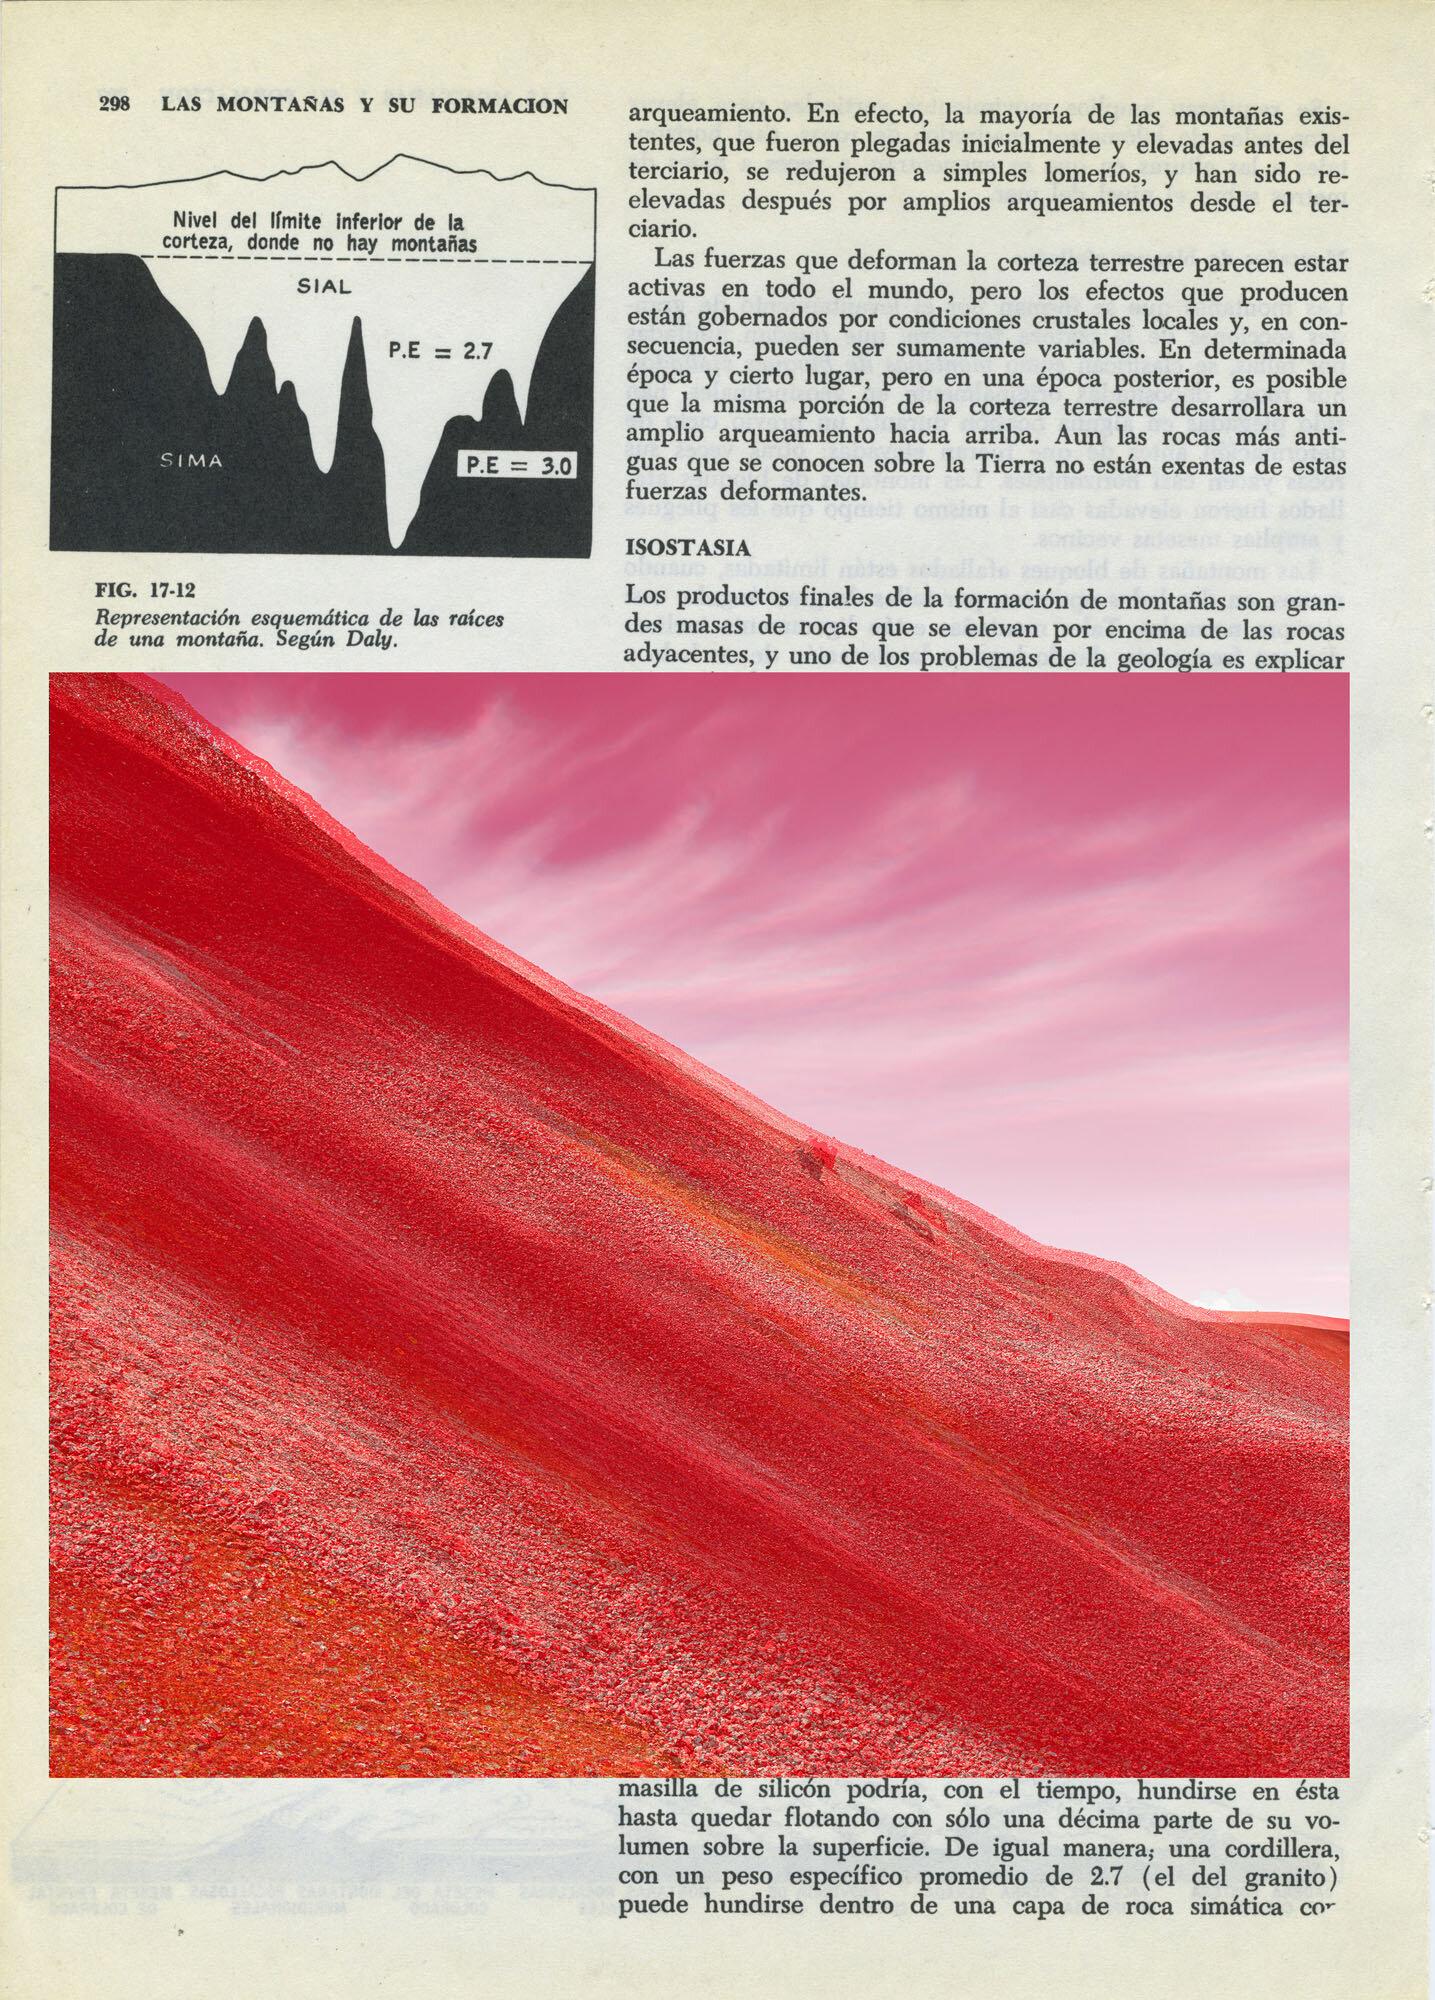 190205 NoA MountainFormation 6.jpg